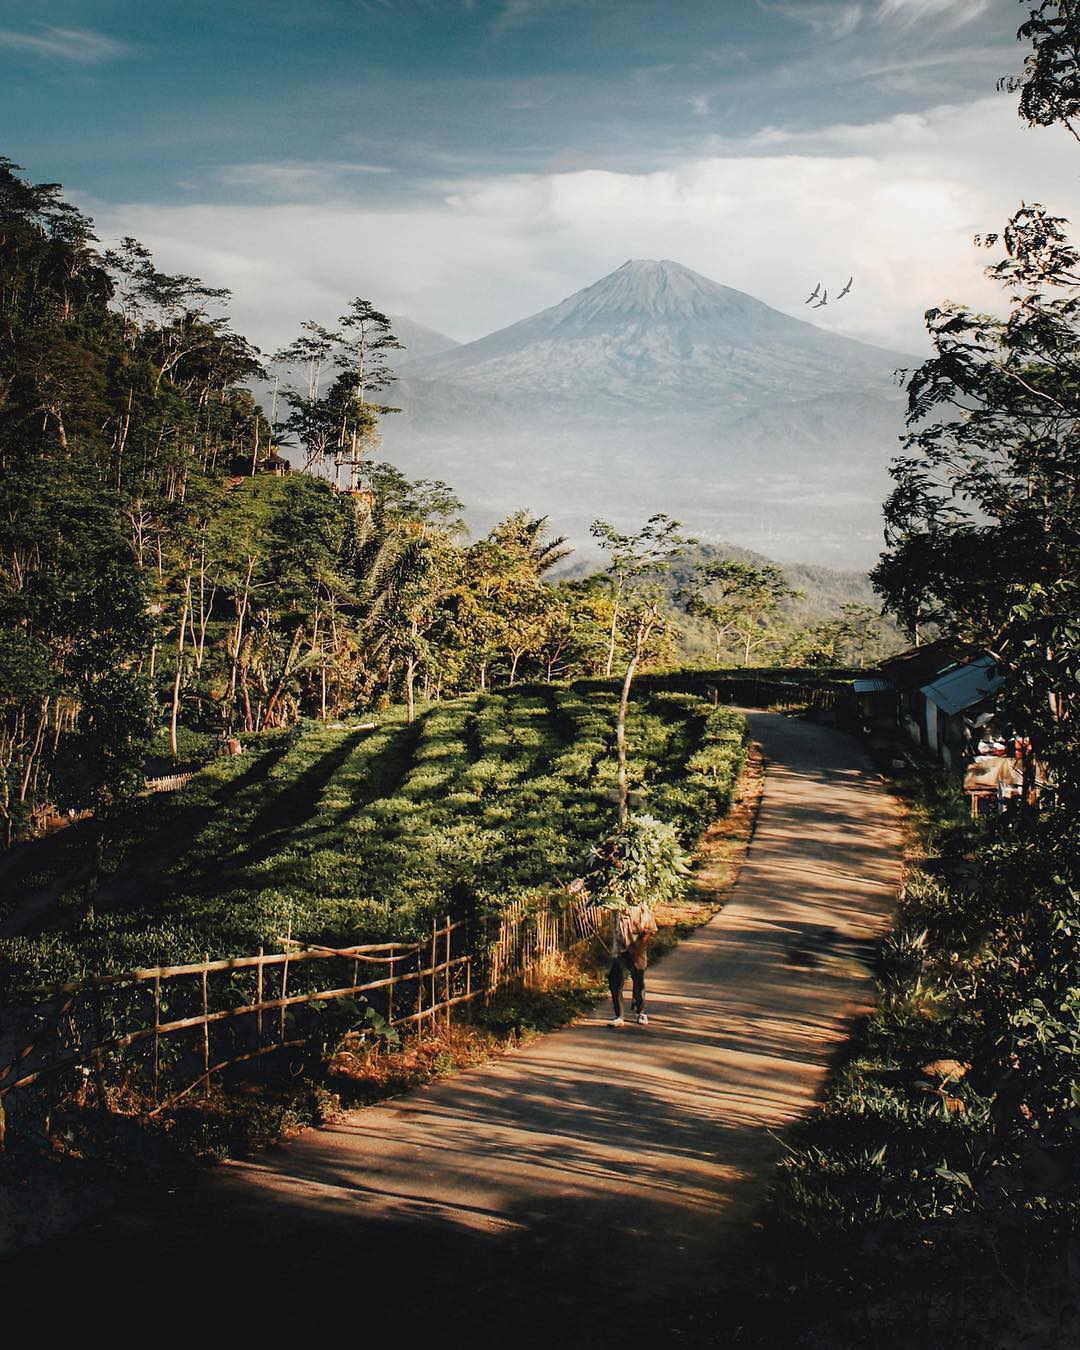 Nglinggo, Nglinggo Yogyakarta, Yogyakarta, Dolan Dolen, Dolaners Nglinggo by awide  - Dolan Dolen